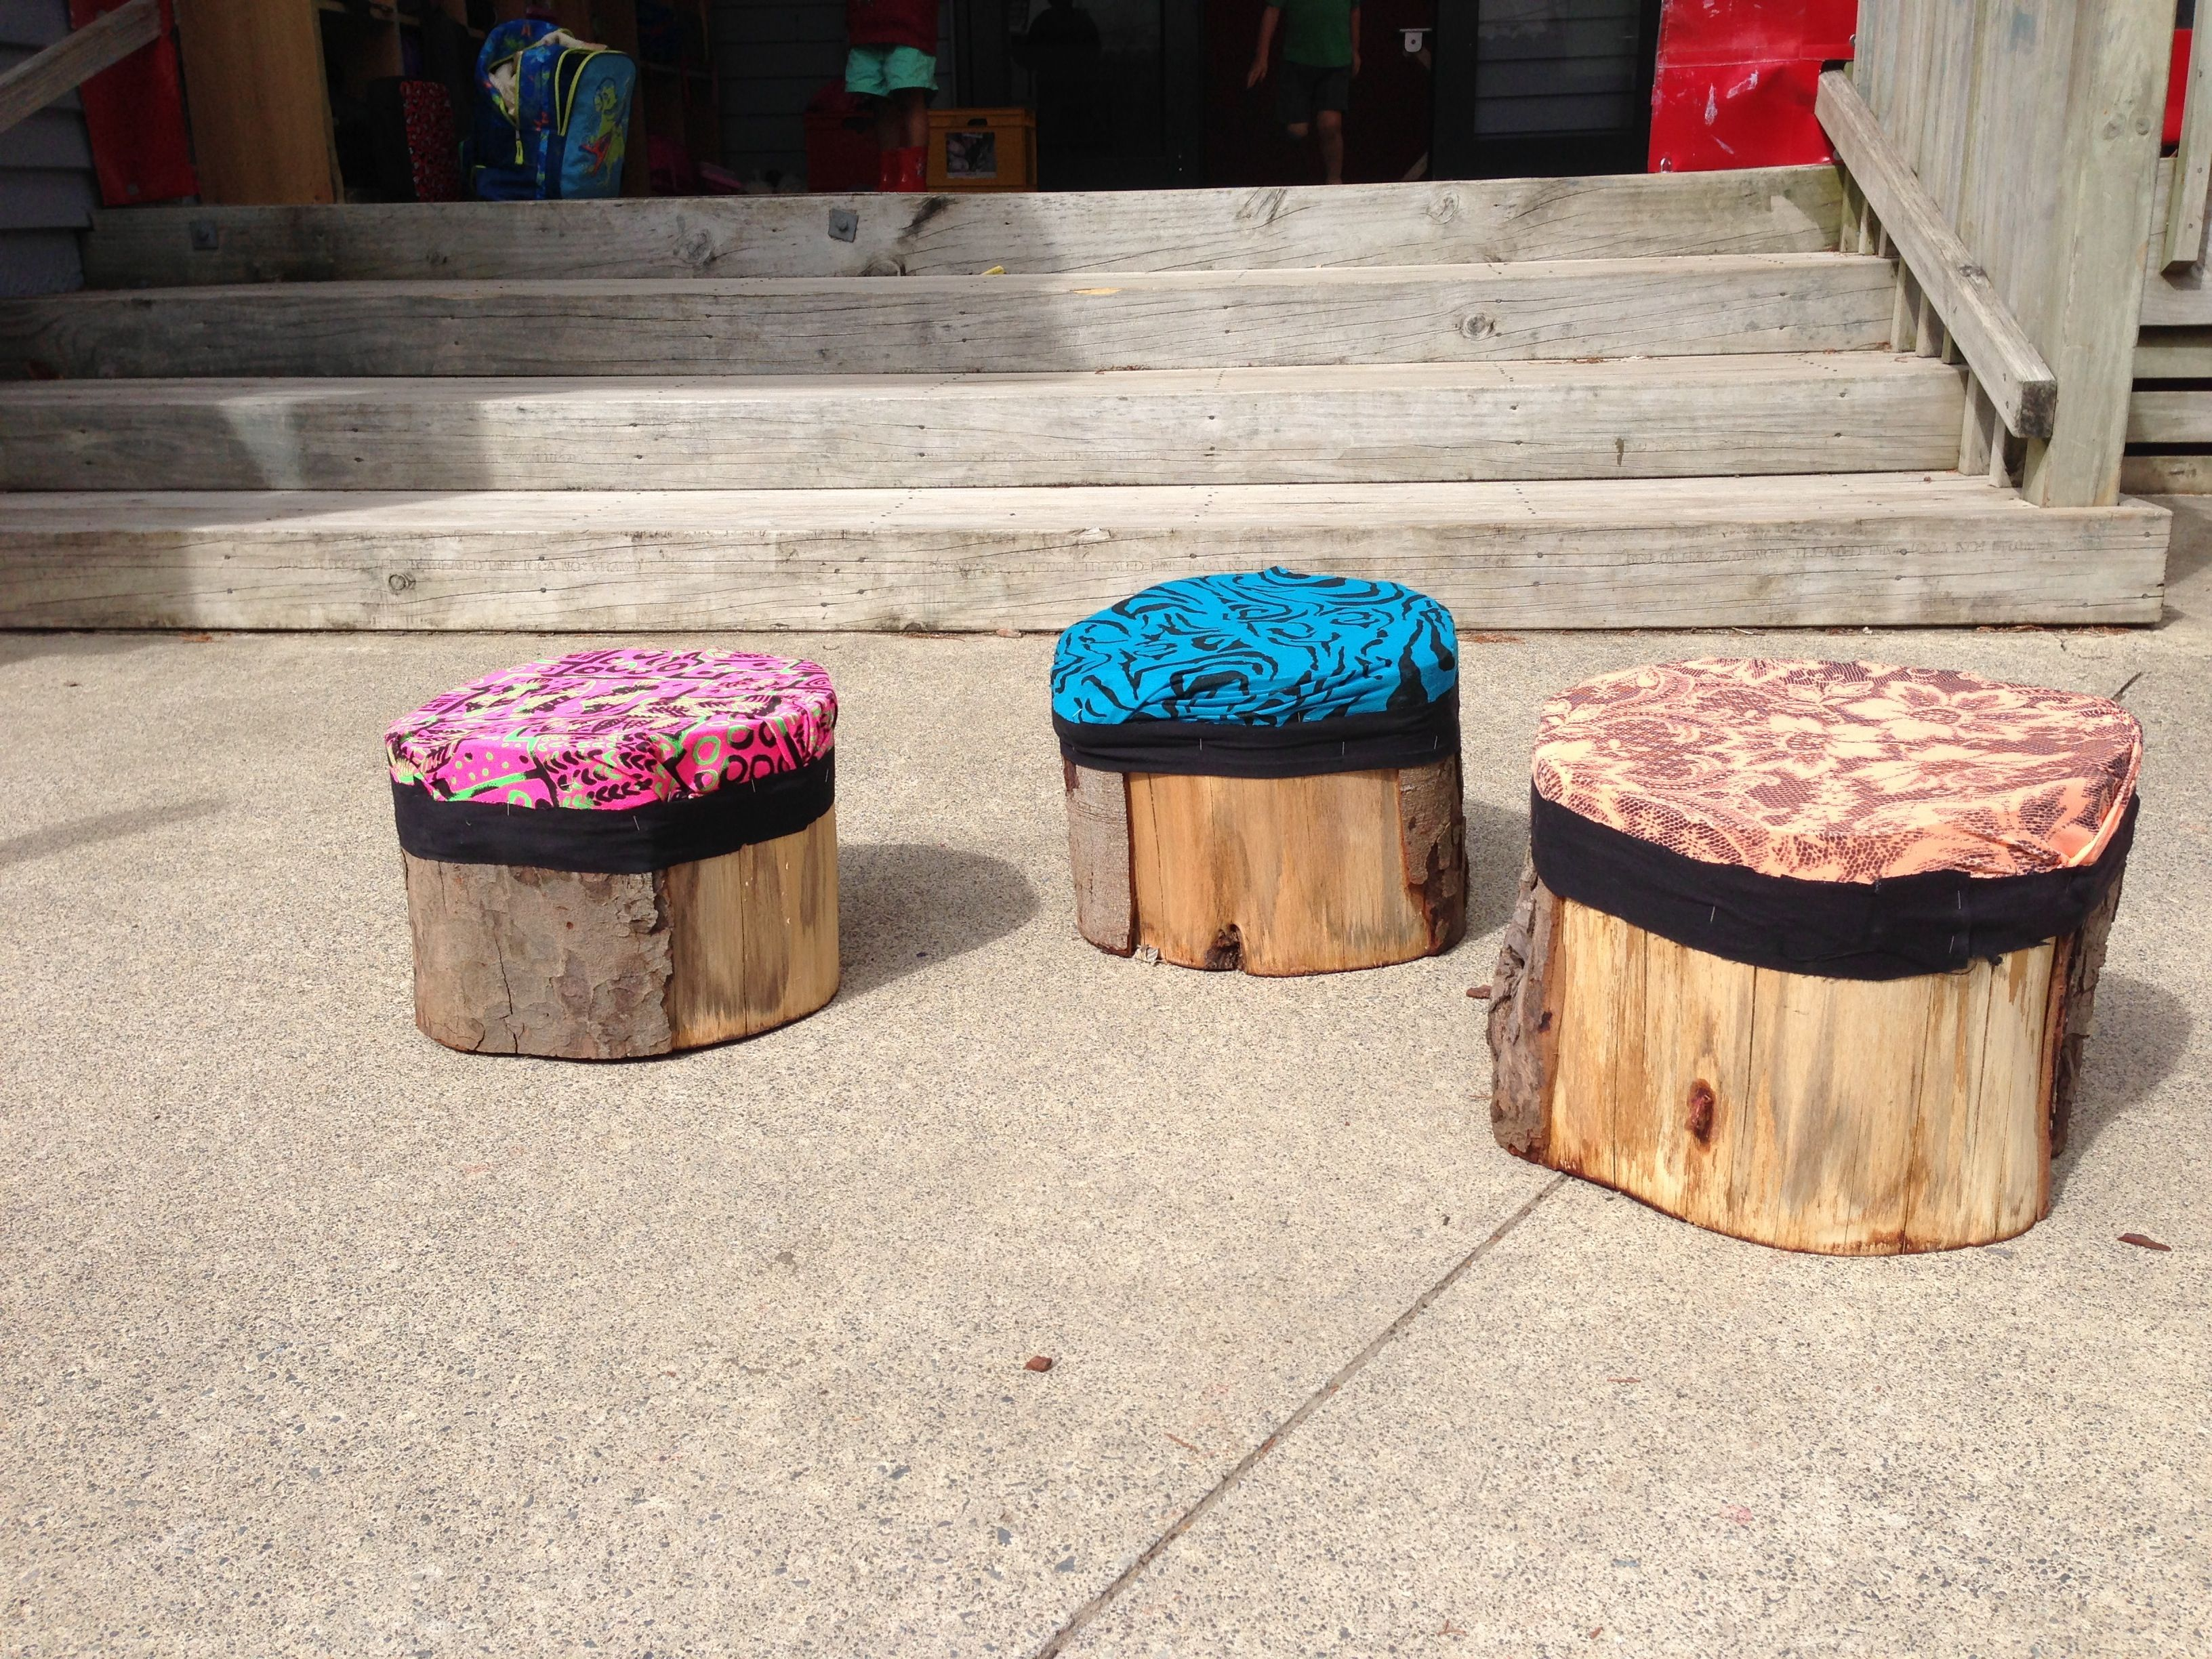 Tree Stump Seats Diy Preschool Tree Stump Seats With Fabric Diy Pinterest